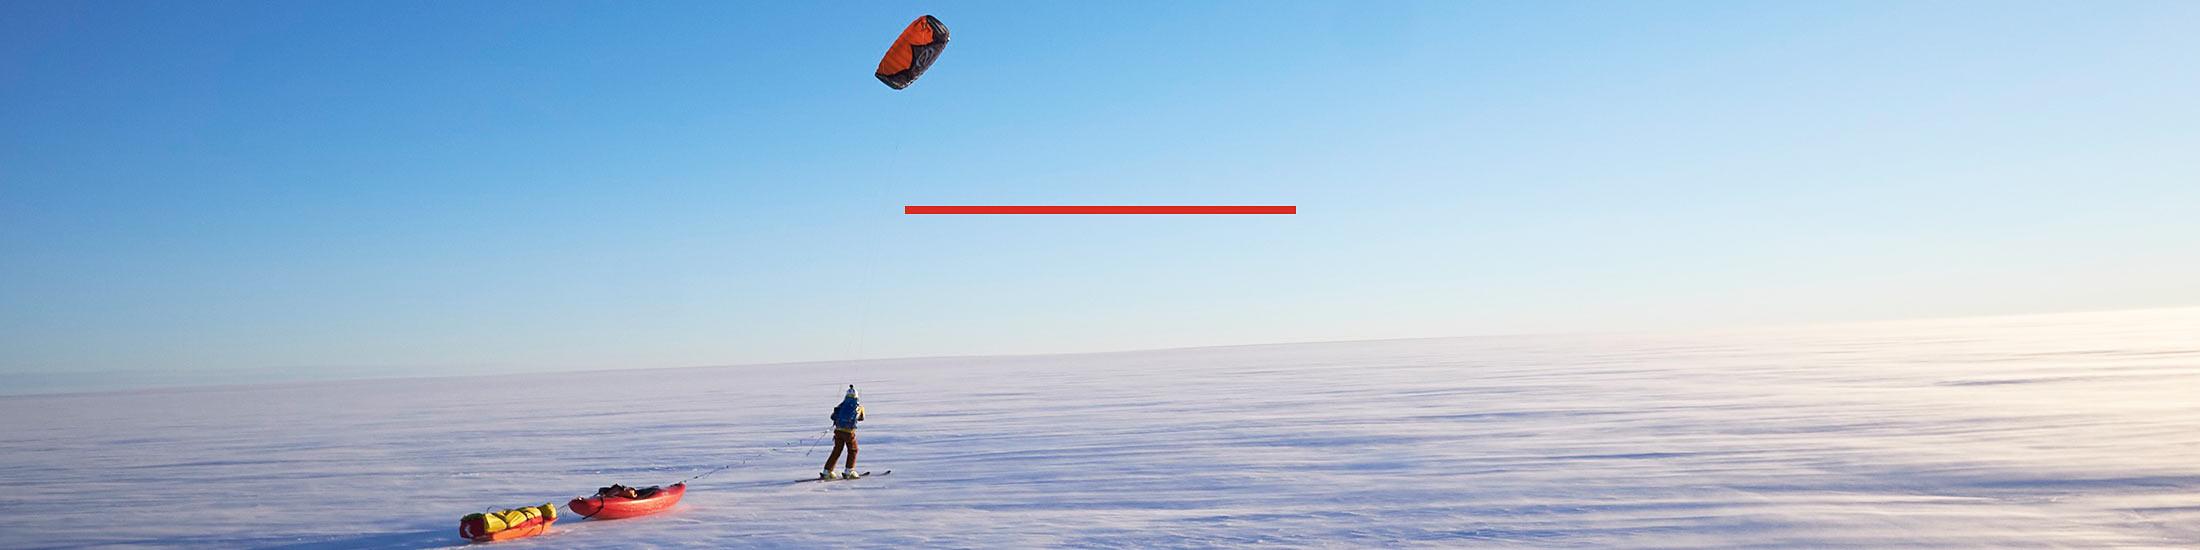 Sarah McNair Landry and Eddie Bauer kayak athlete Ben Stookesberry crossing Greenland's ice cap